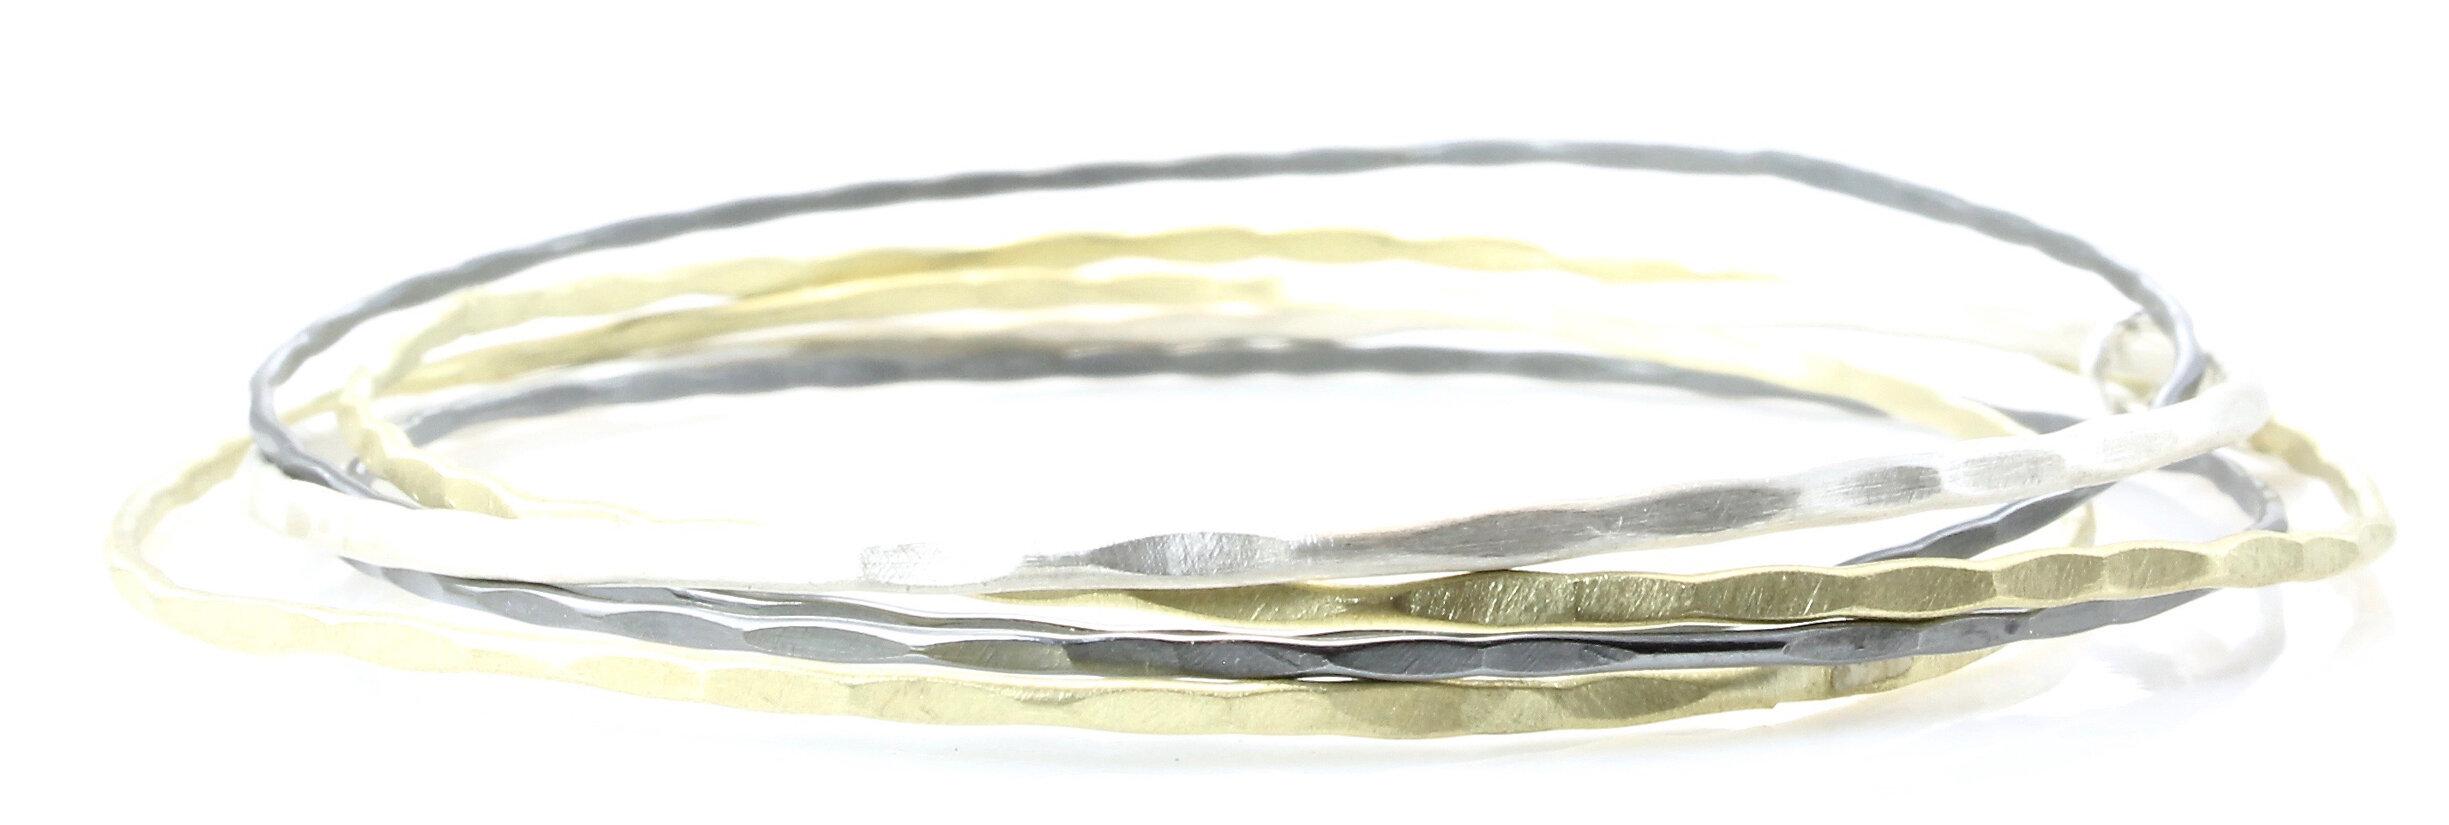 5 interlocking, hammered bangle bracelets in 18k gold, sterling silver and oxidized sterling silver